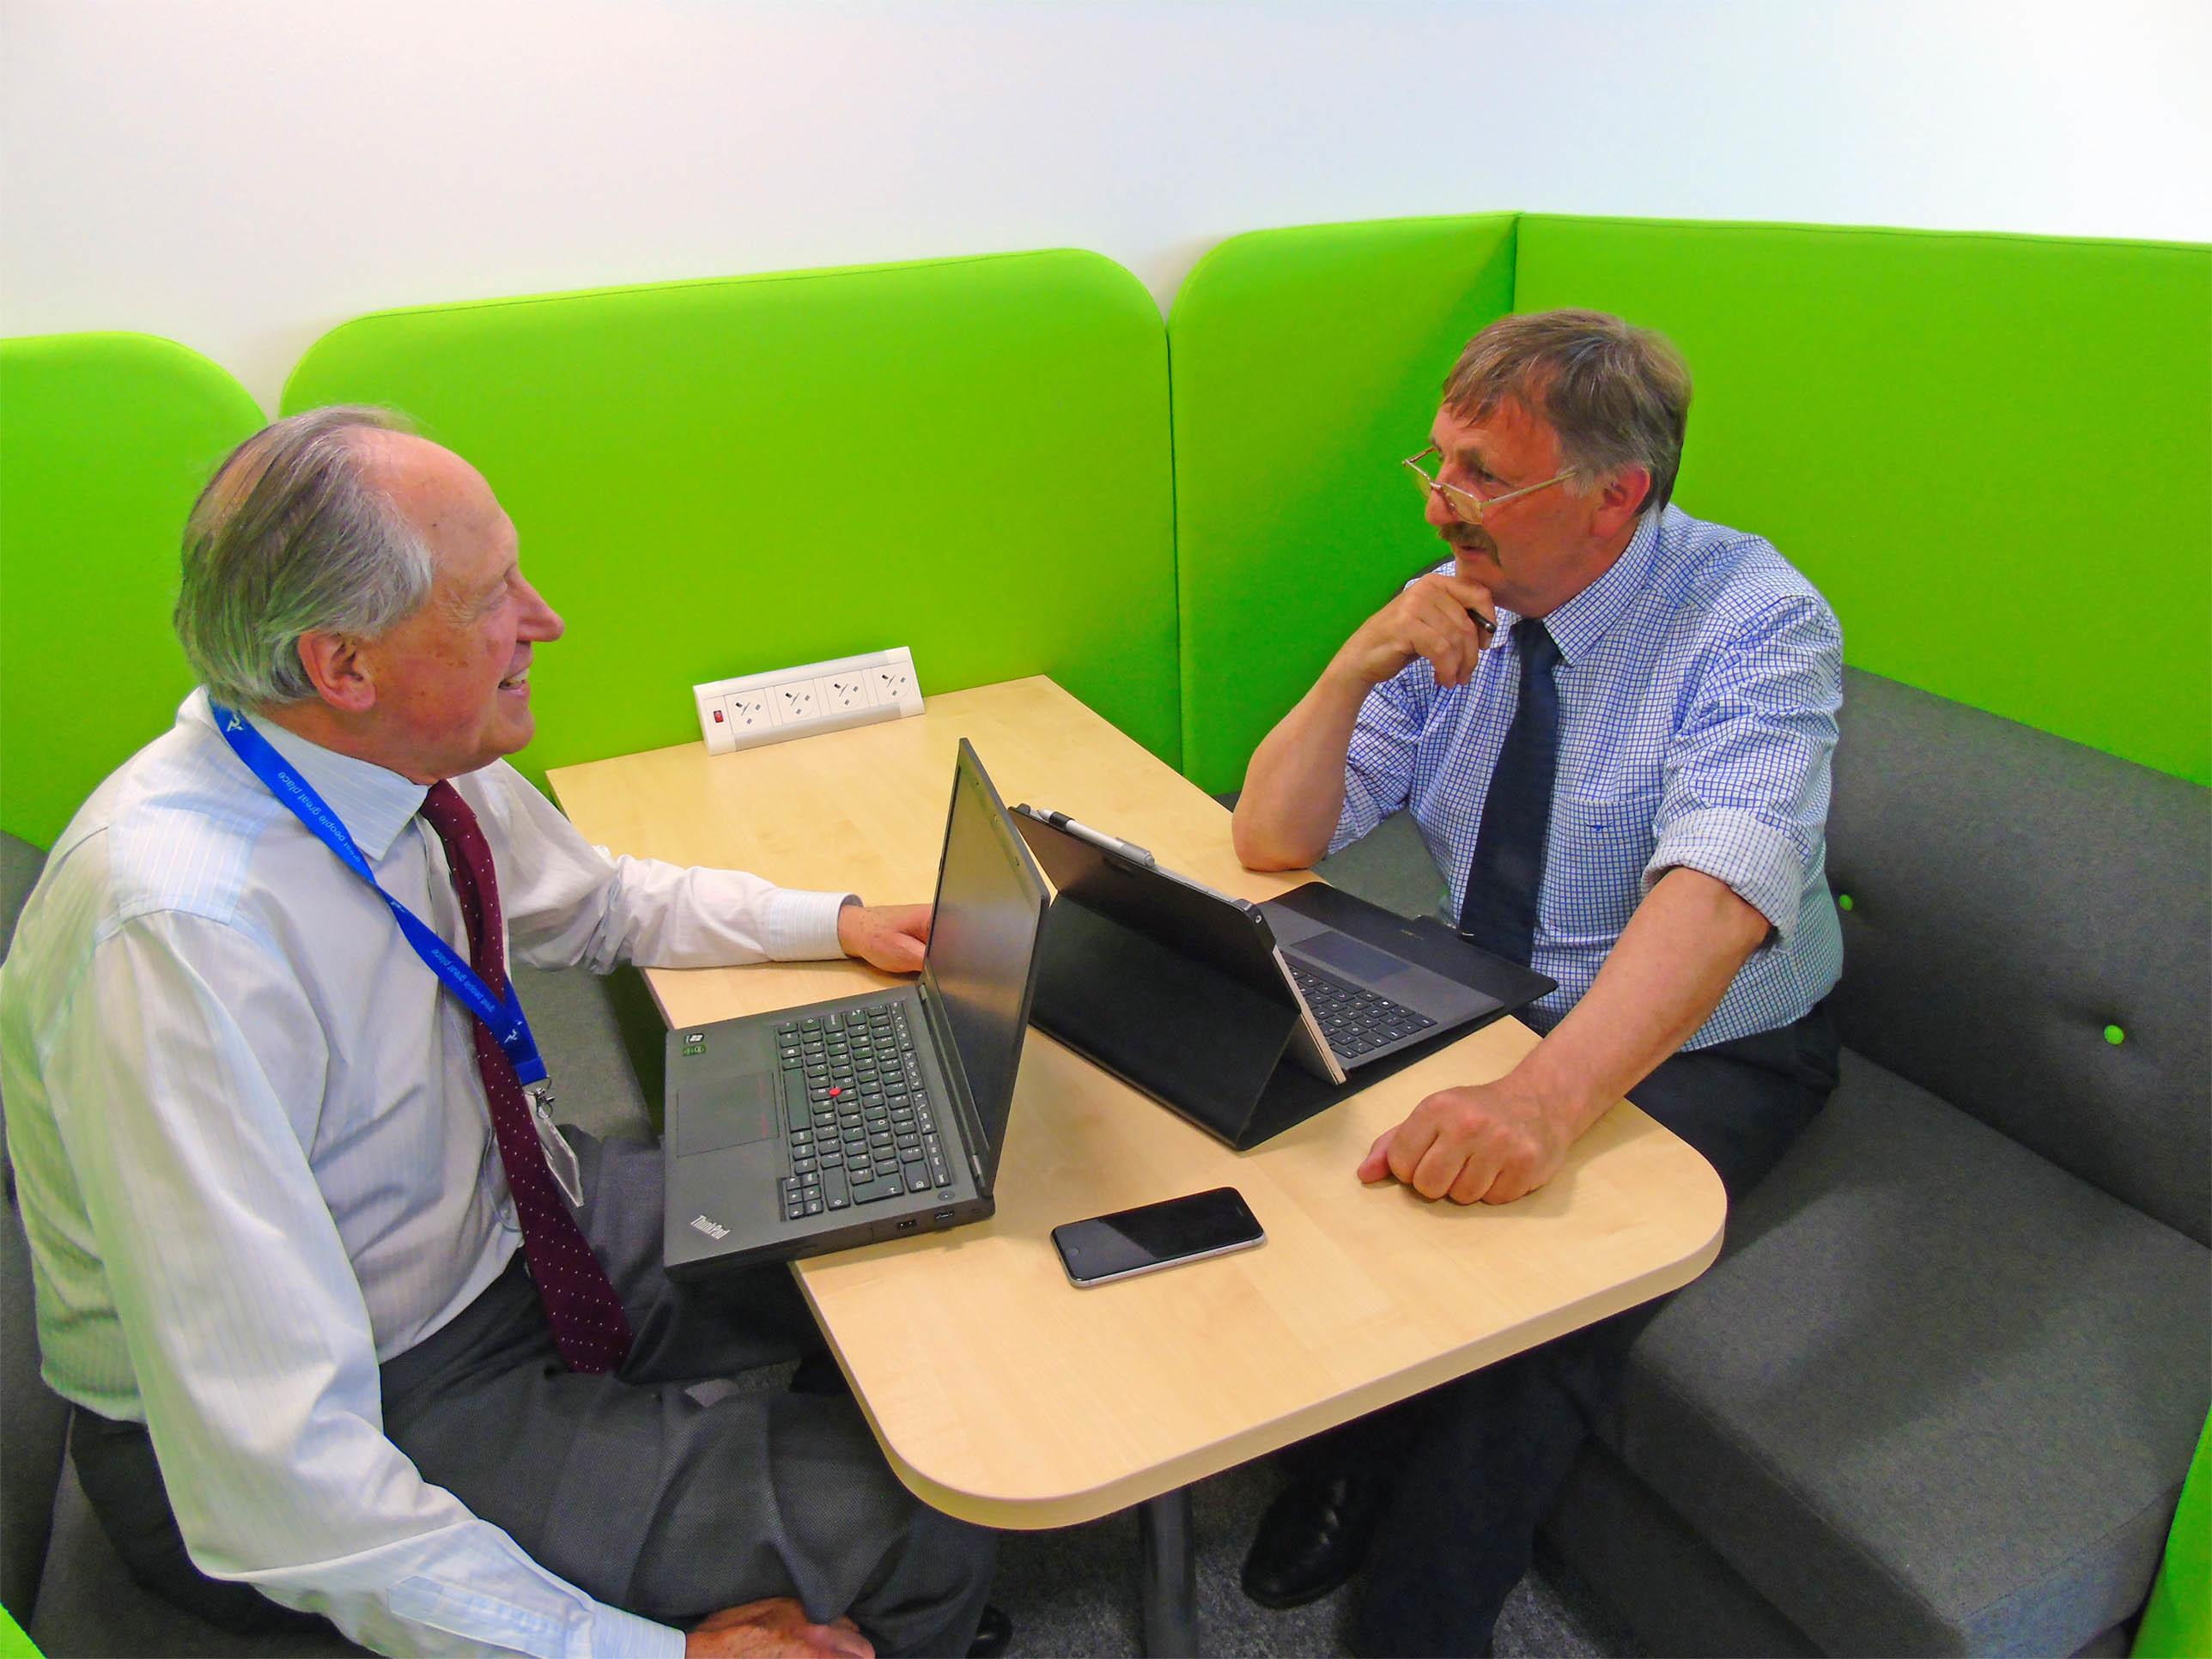 Angus Council finance convener Angus Macmillan Douglas (left) and council leader Bob Myles. discuss the challenges ahead